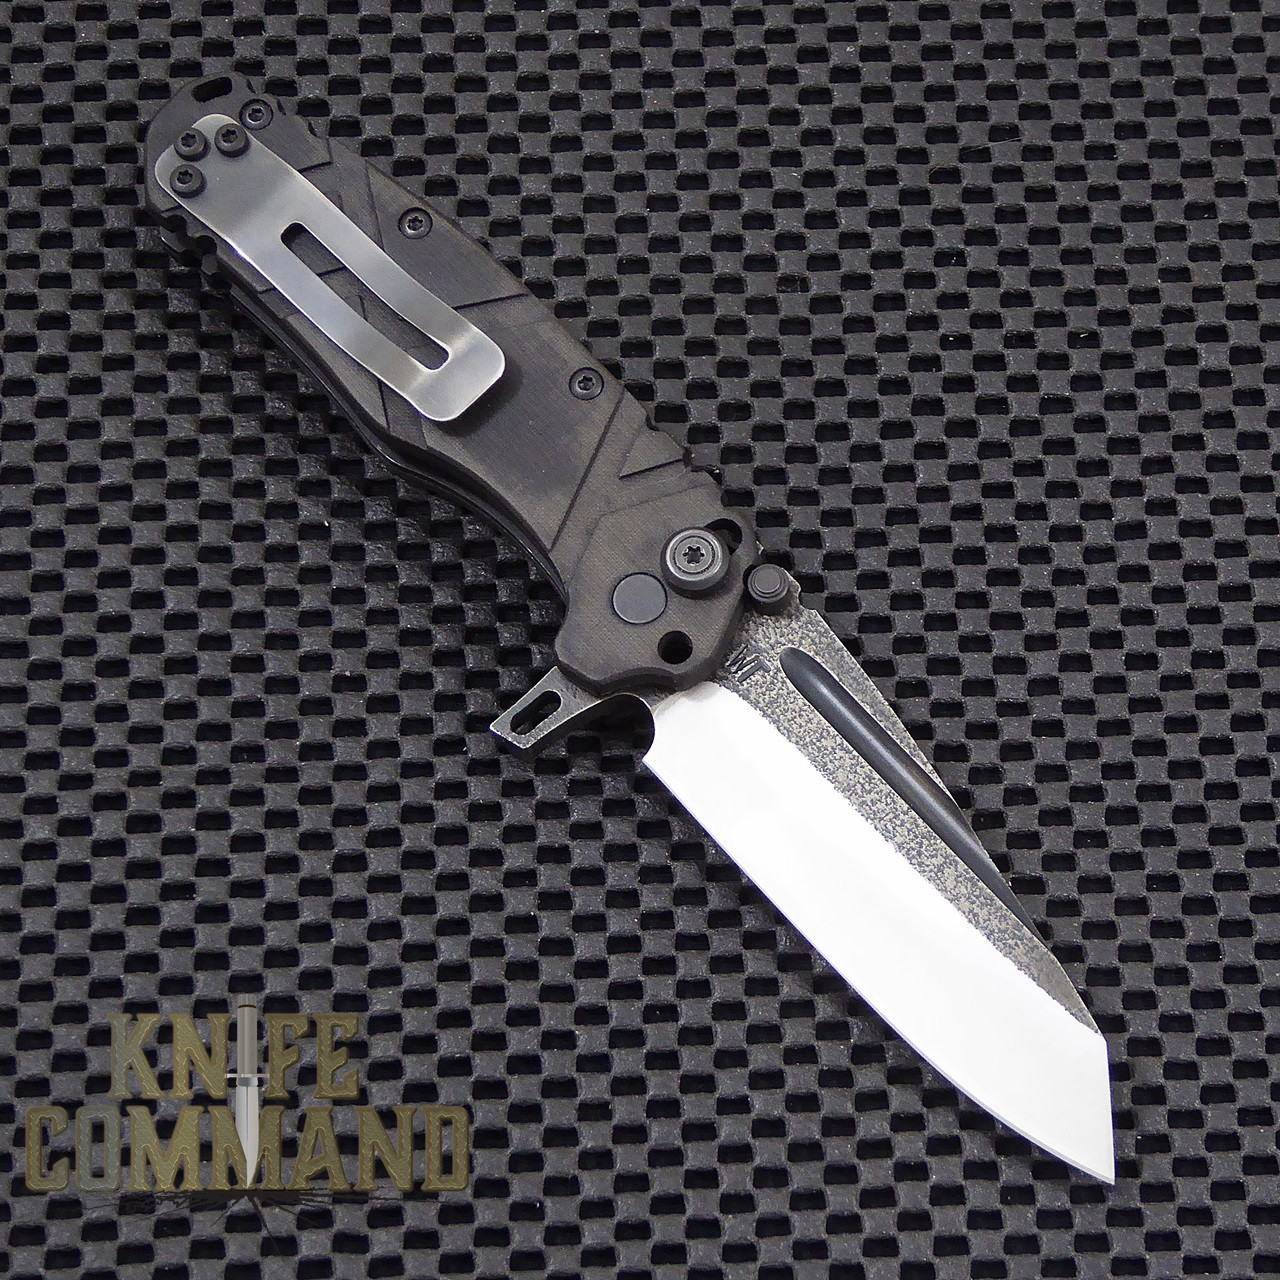 Wander Tactical Custom Sköll Wolf Extreme Duty Folding Knife.  Reversible heavy duty pocket clip.